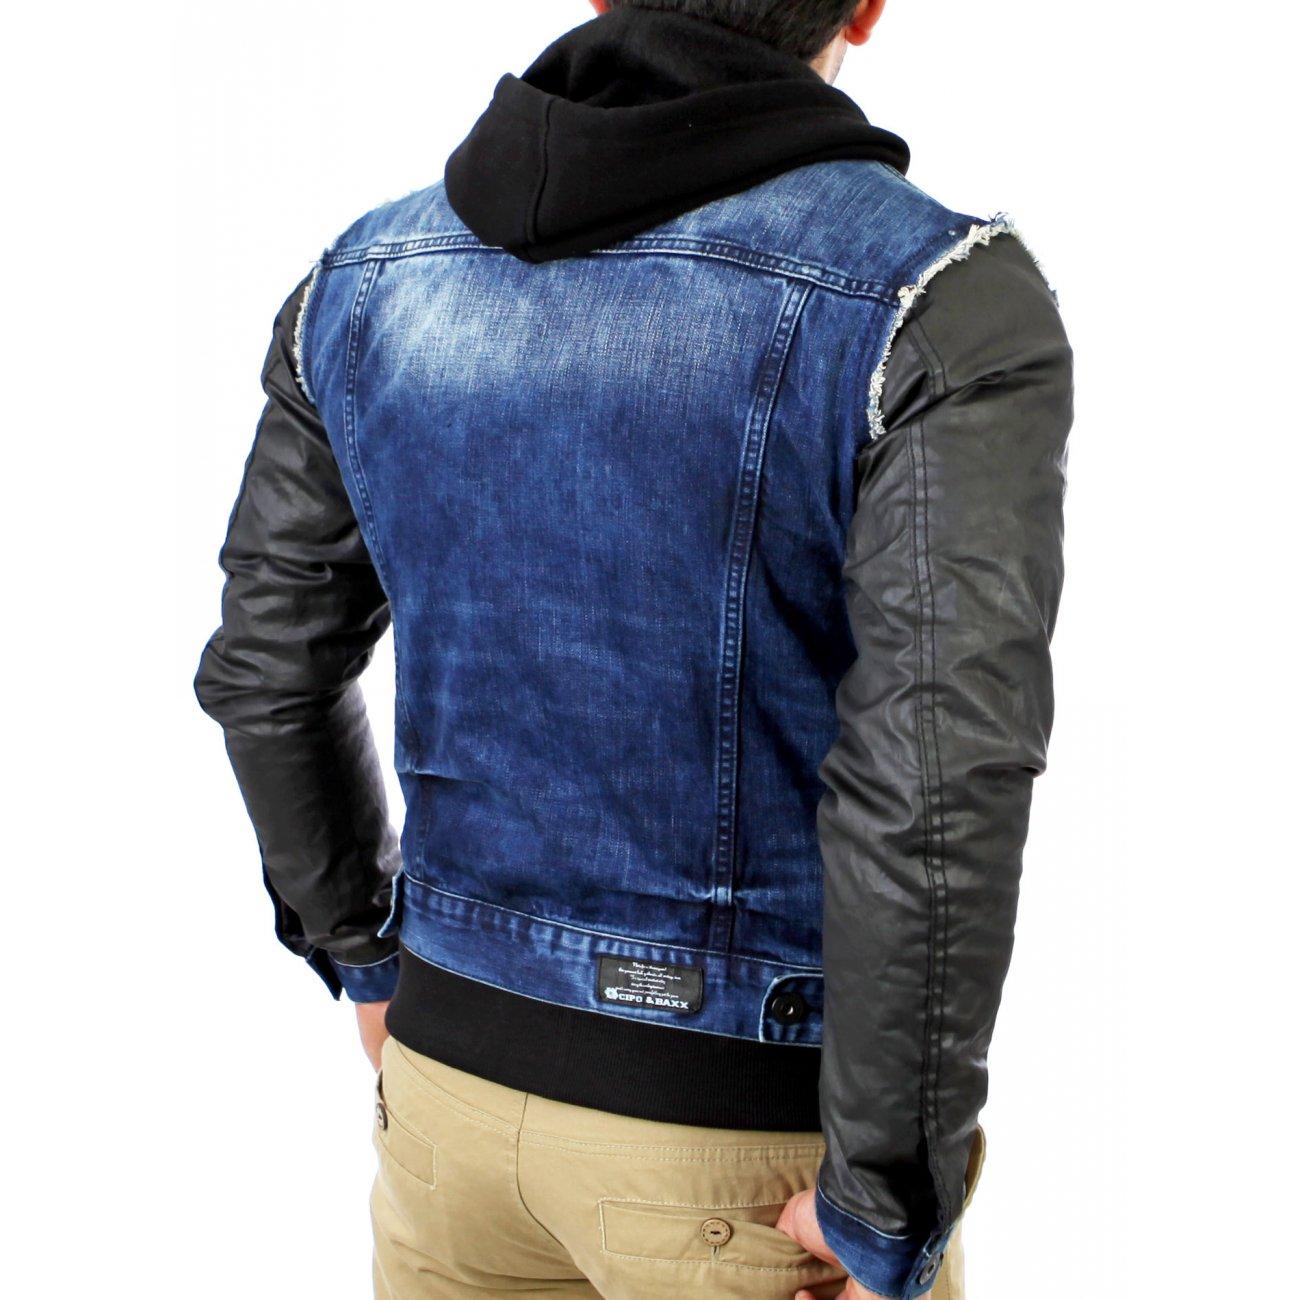 cipo baxx jeansjacke herren blau schwarz c 1290 kaufen. Black Bedroom Furniture Sets. Home Design Ideas